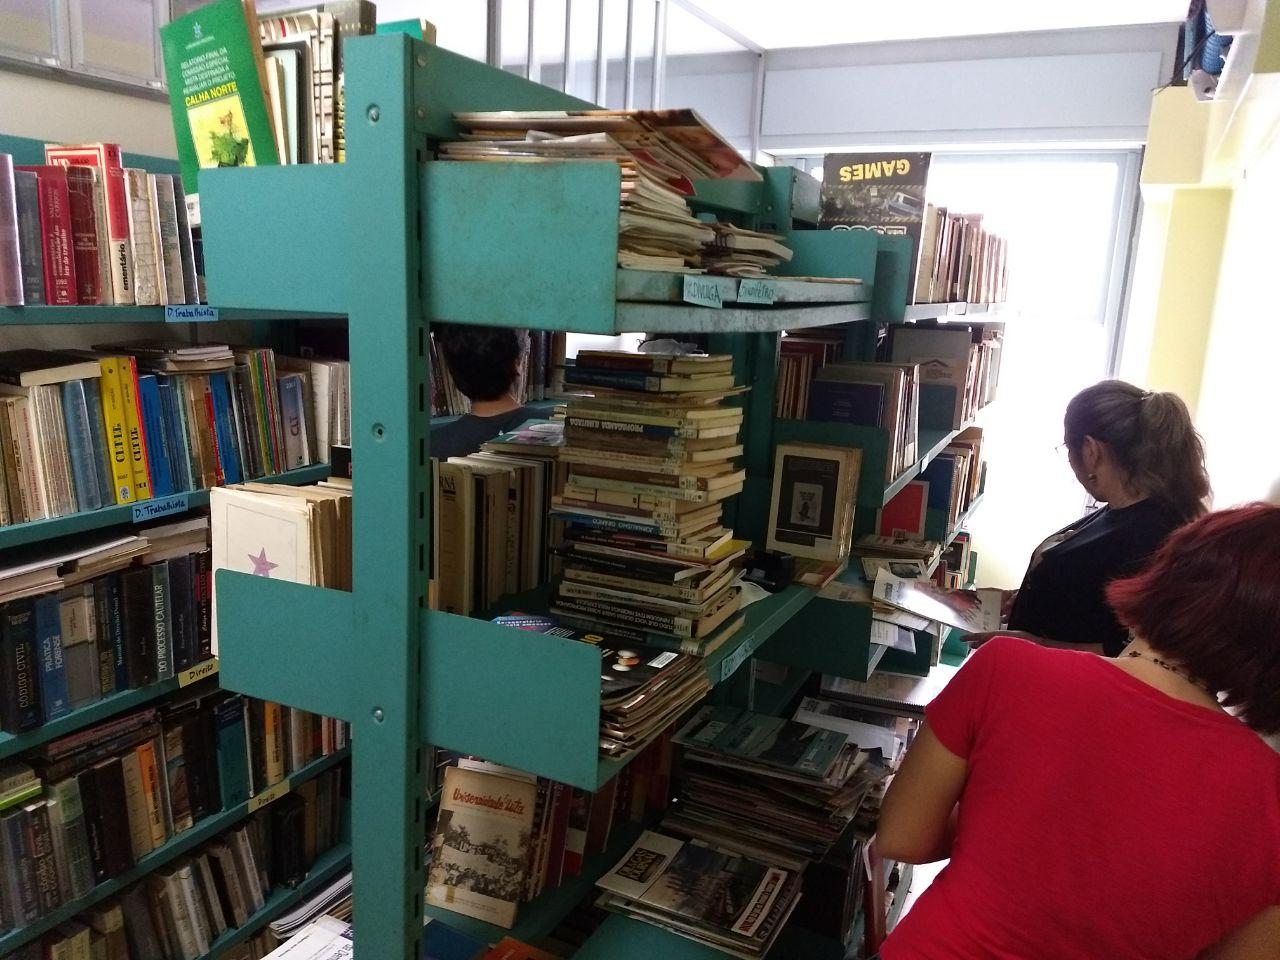 Biblioteca do Sindipetro-RJ realiza um mutirão WhatsApp Image 2017 10 02 at 08